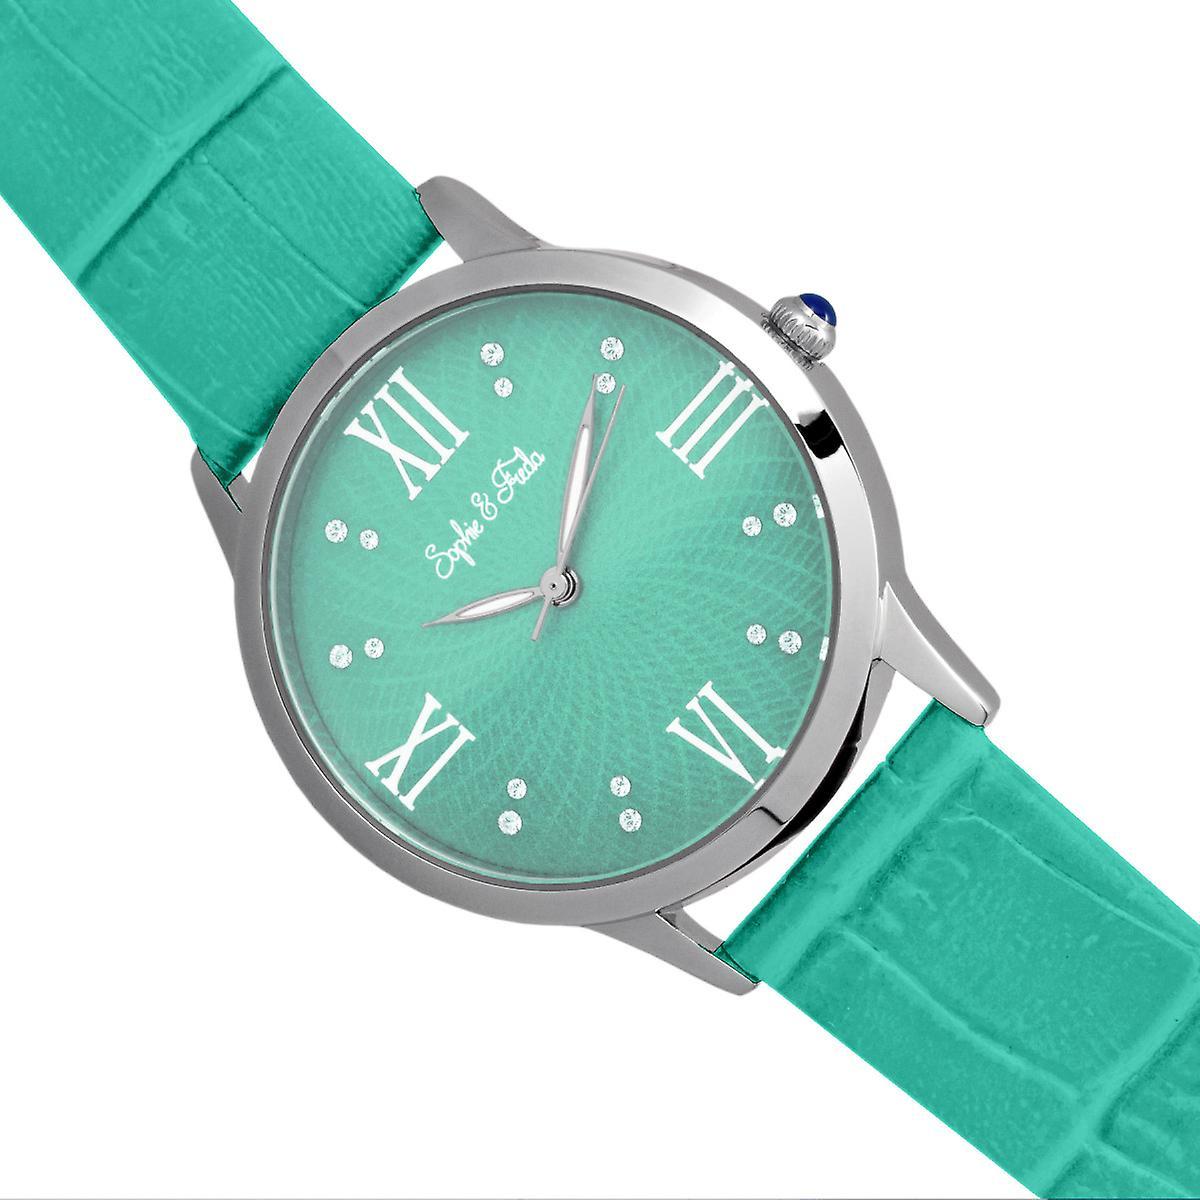 Sophie & Freda Sonoma Leather-Band Watch w/Swarovski Crystals - Silver/Teal